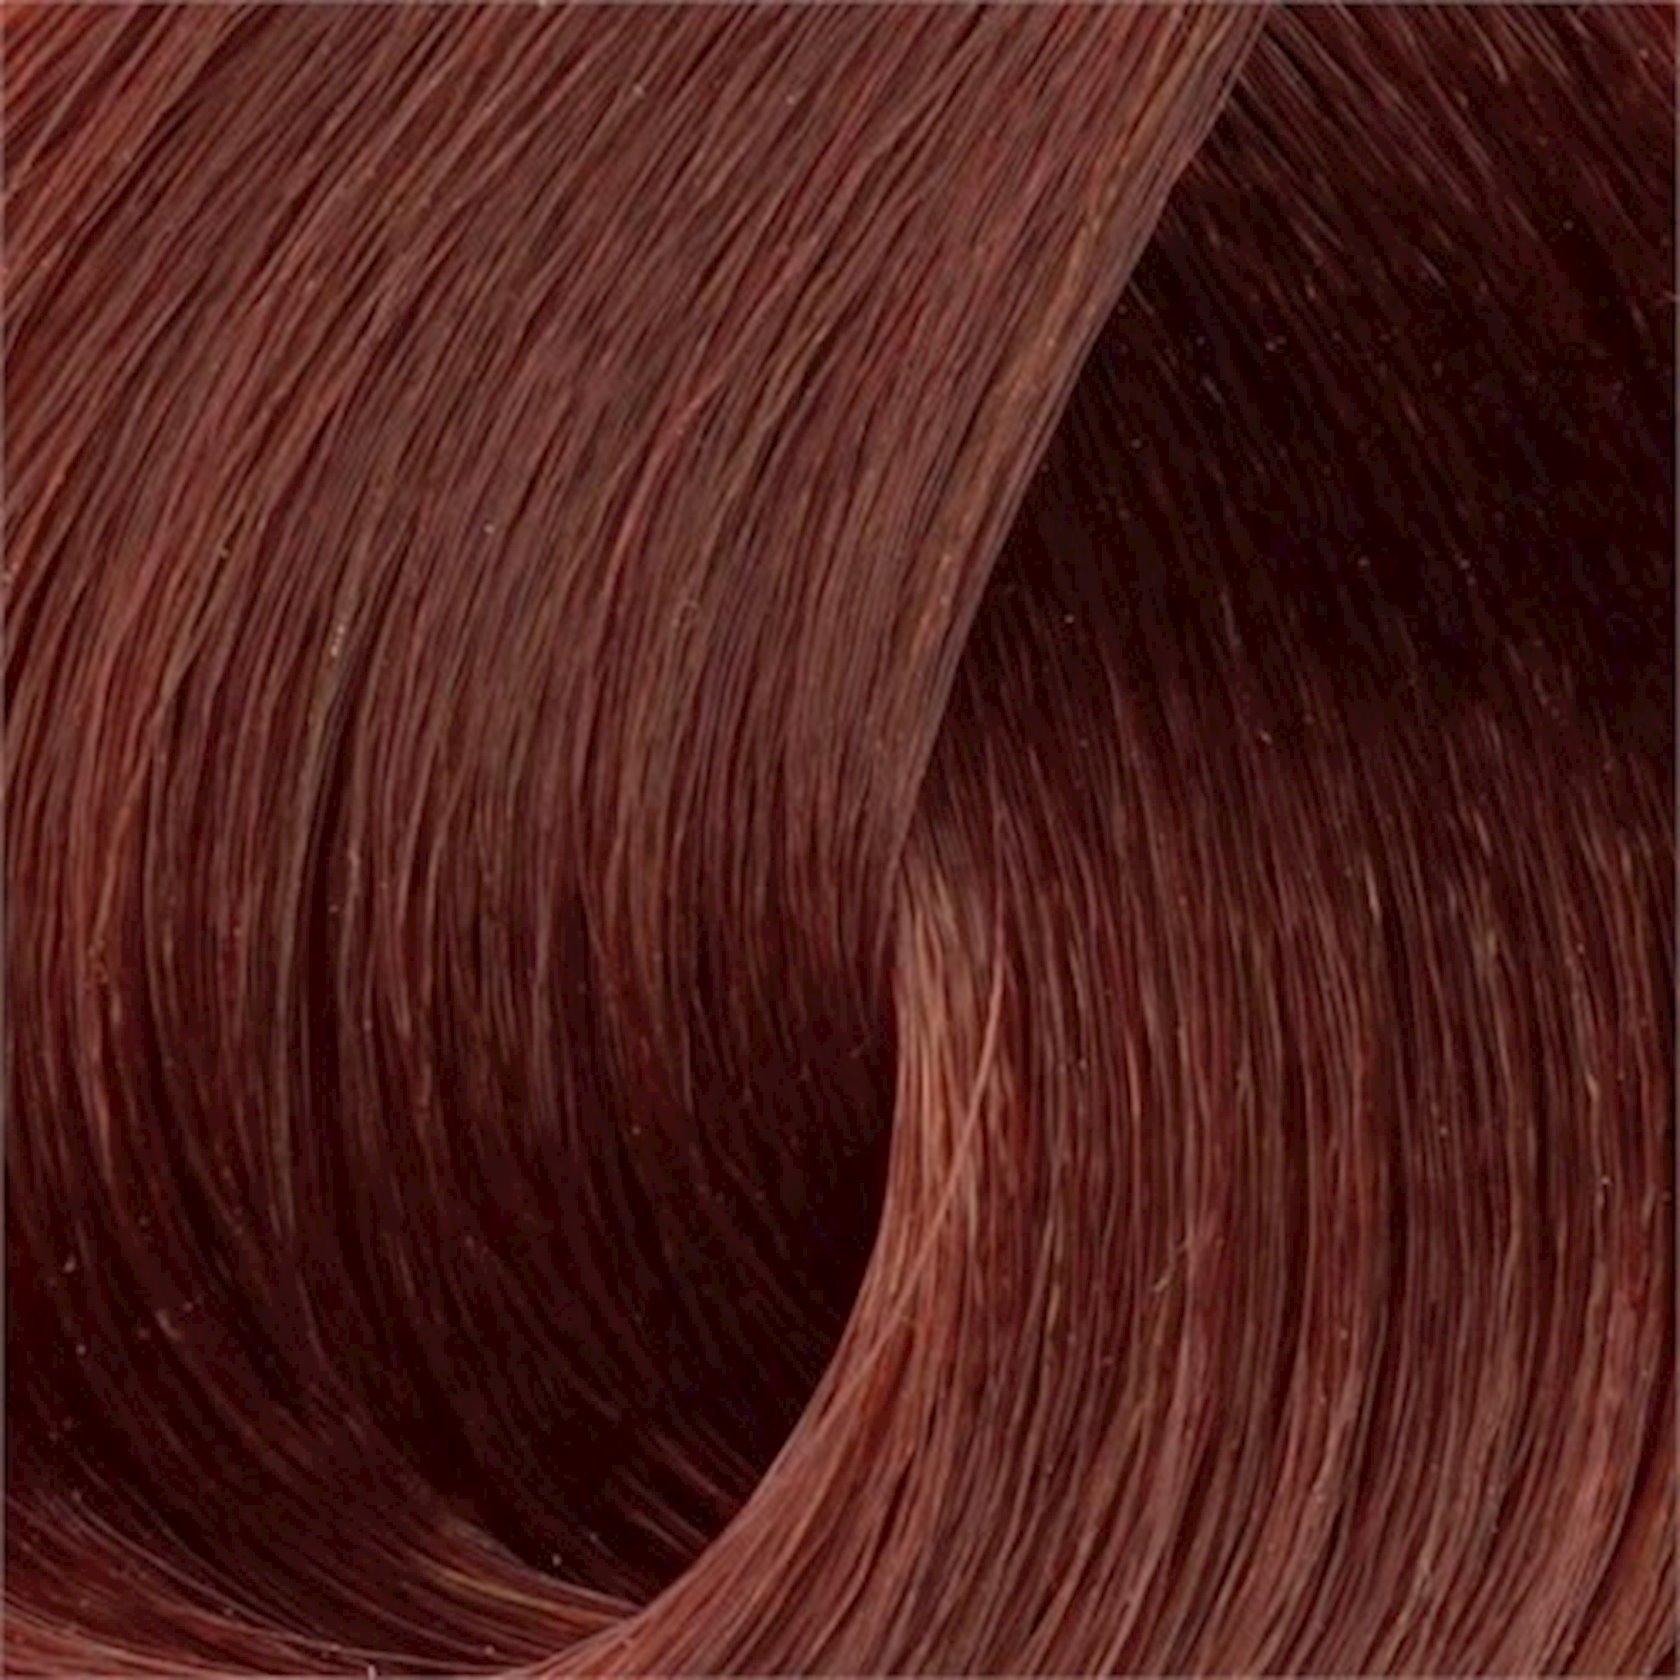 Saç üçün qalıcı krem boya Exicolor Permanent Hair Color Cream 100 ml №6.7 Çikolata Kahve, Şokoladlı qəhvə